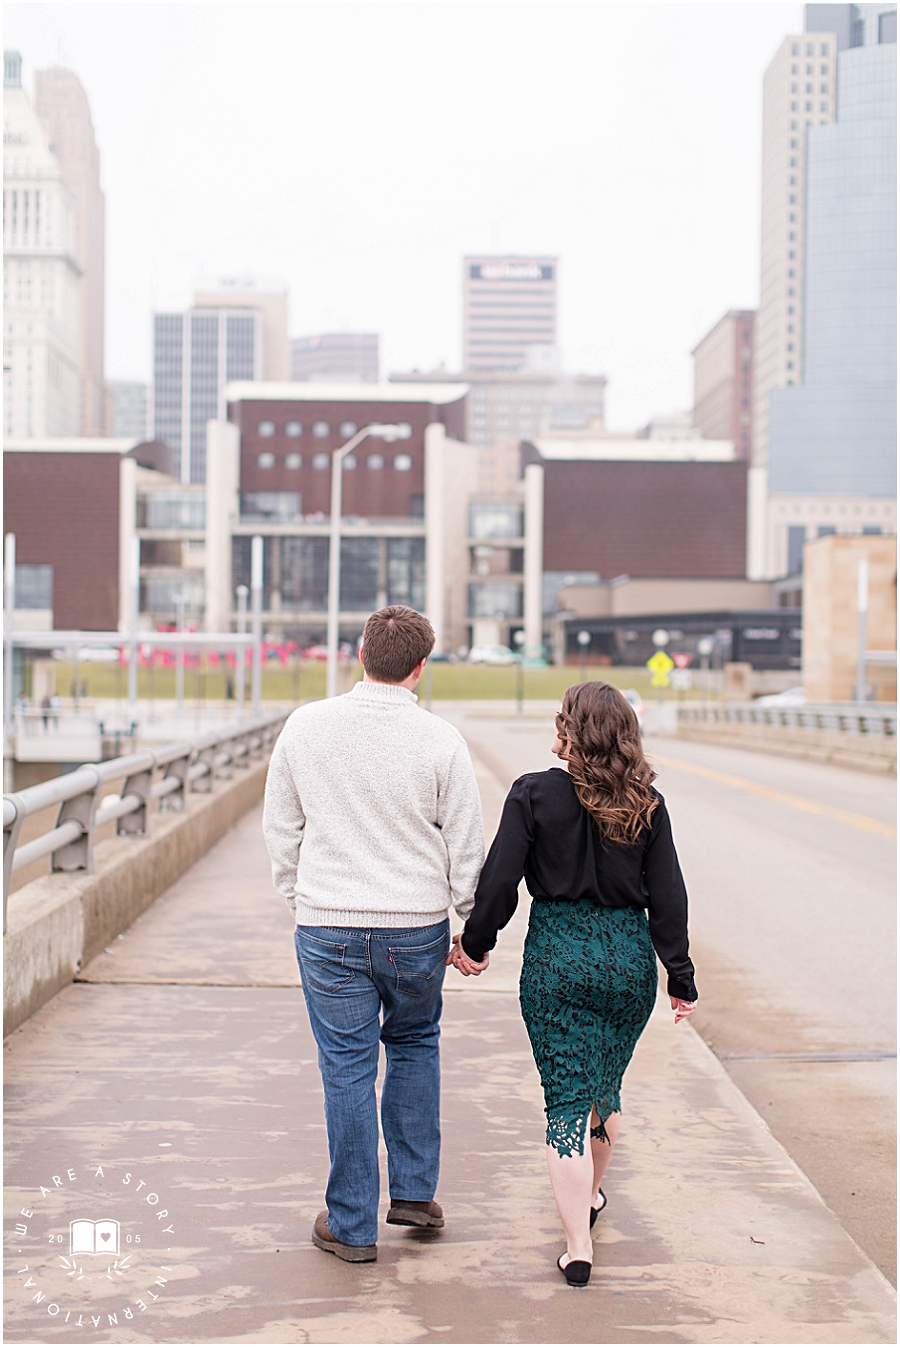 Cincinnati Wedding Photographer_We Are A Story_Molly & Matt Engagement Session_2537.jpg